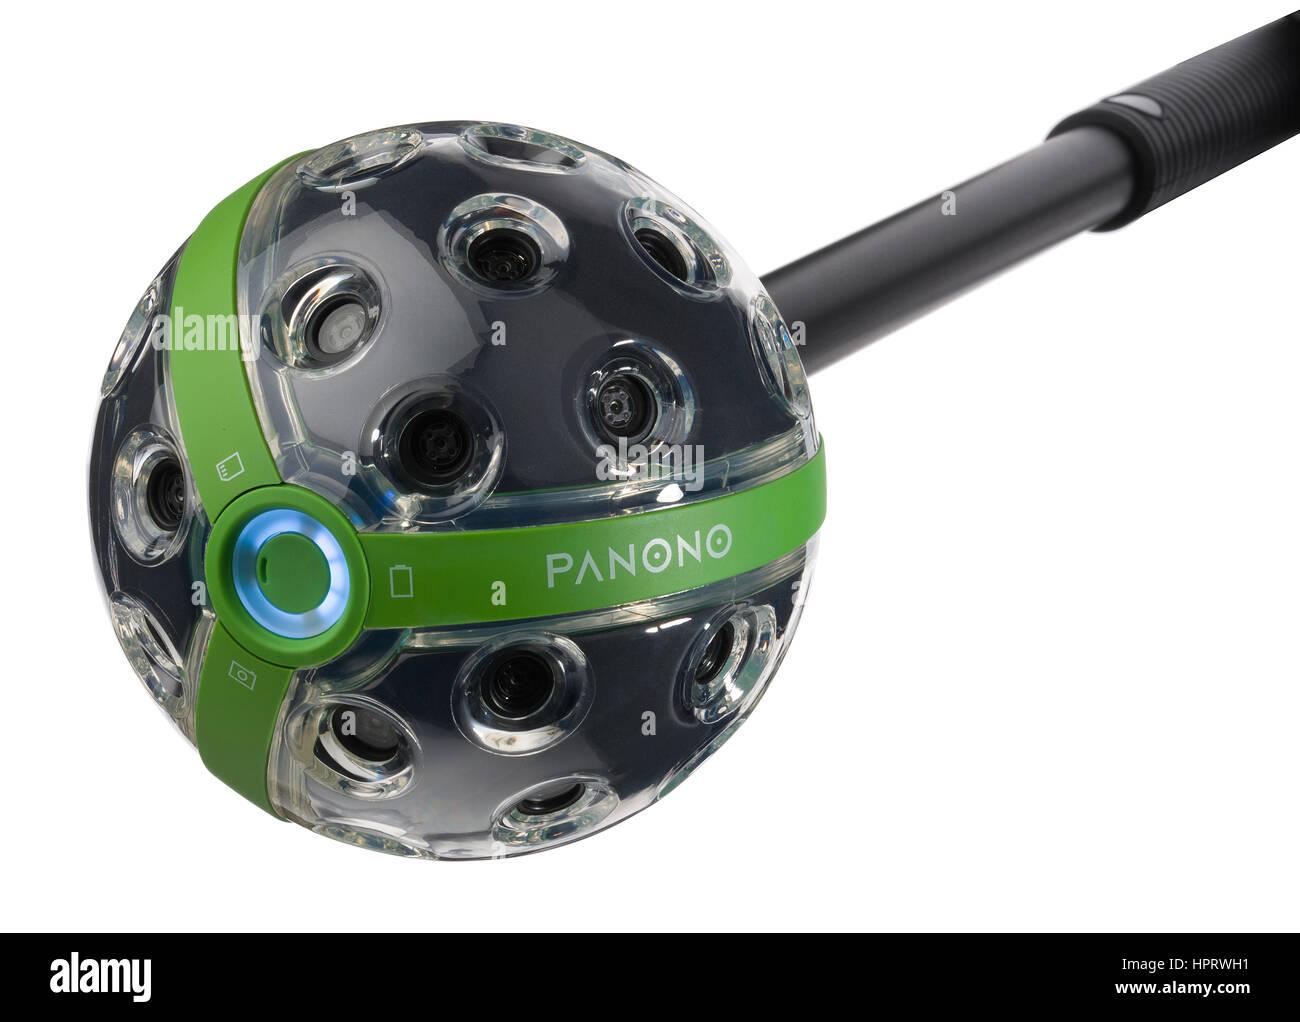 Panono 360 degree camera. Panoramic ball camera that makes full 360 degree images. - Stock Image